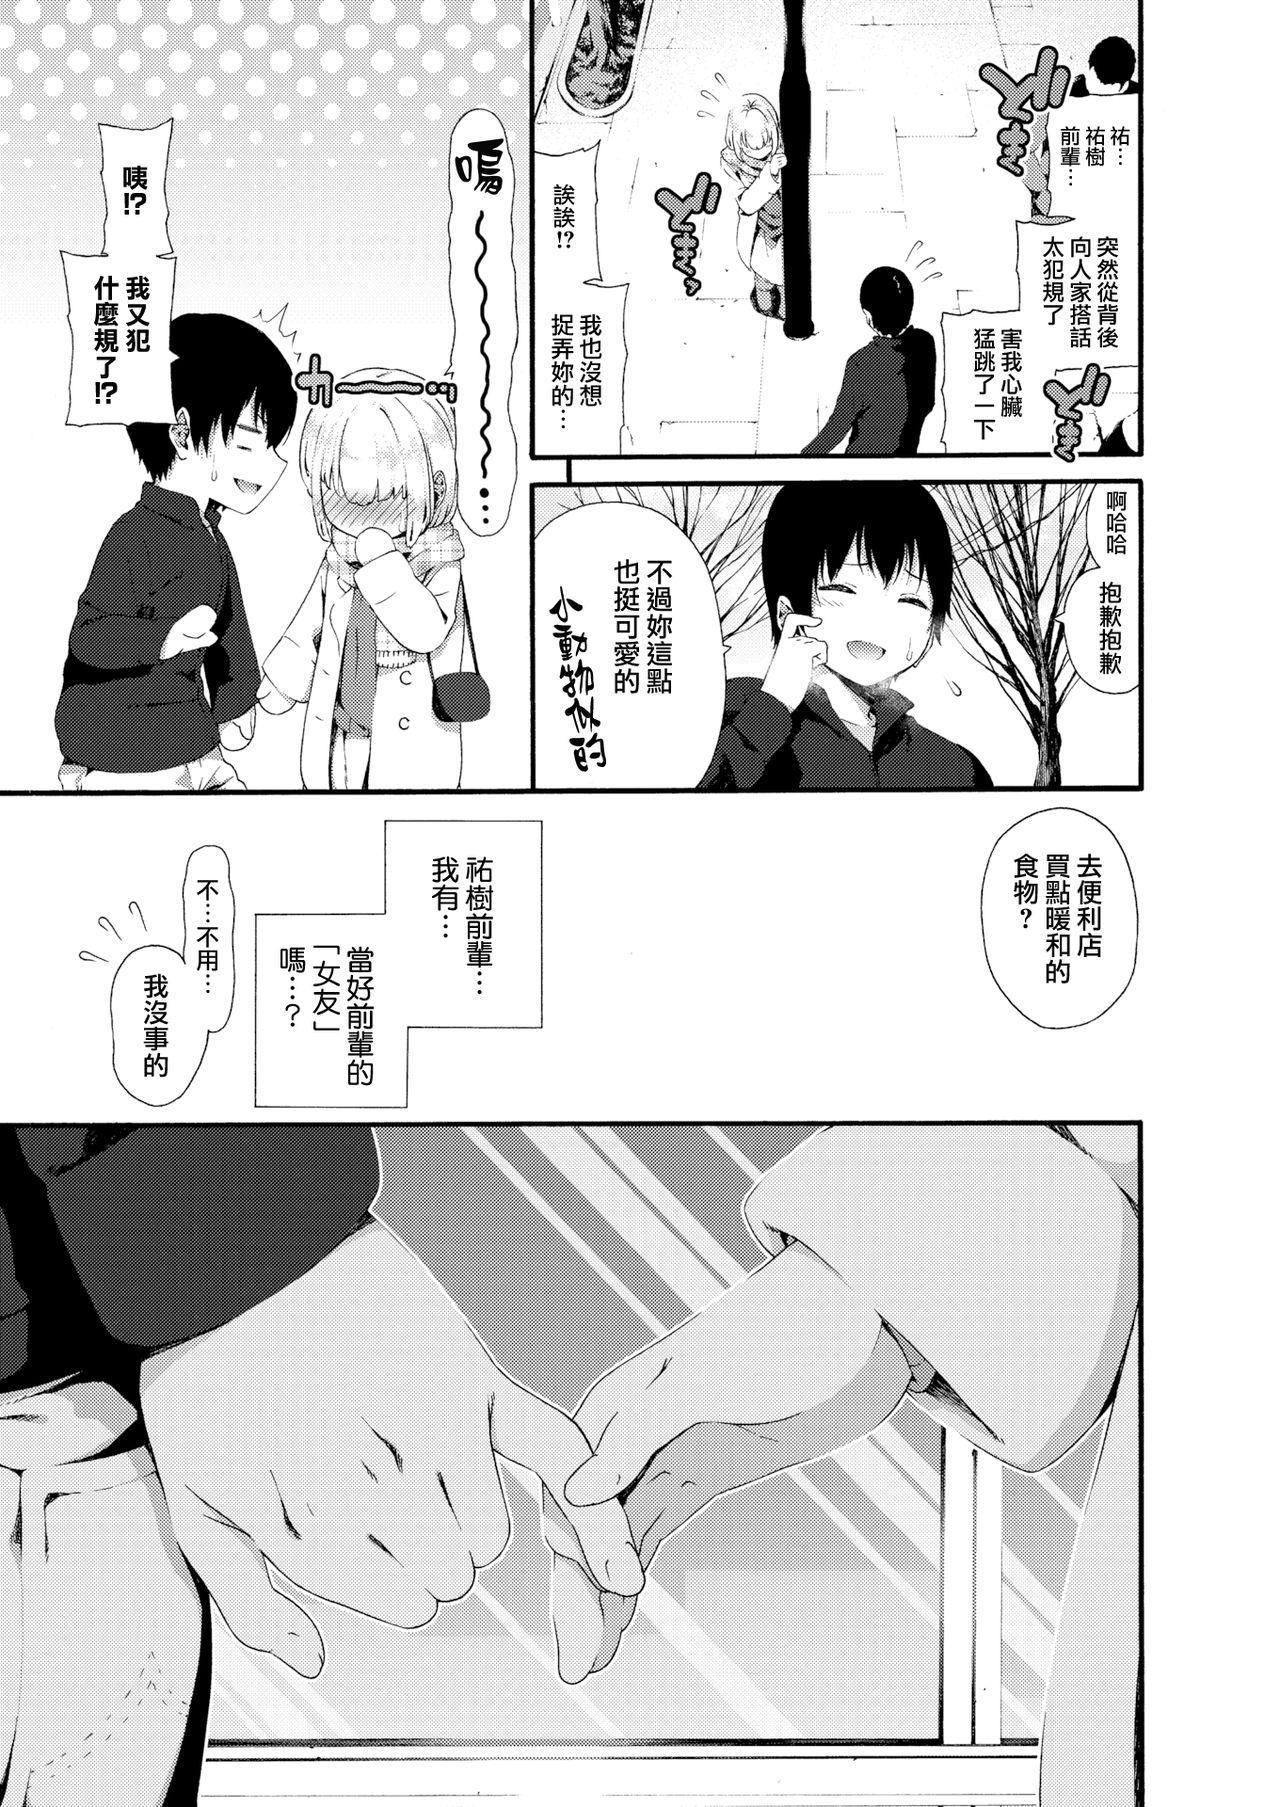 [Izure] Iho-chan no Jijou - Ihochan no situation. (COMIC X-EROS #63) [Chinese] [無邪気漢化組] [Digital] 2